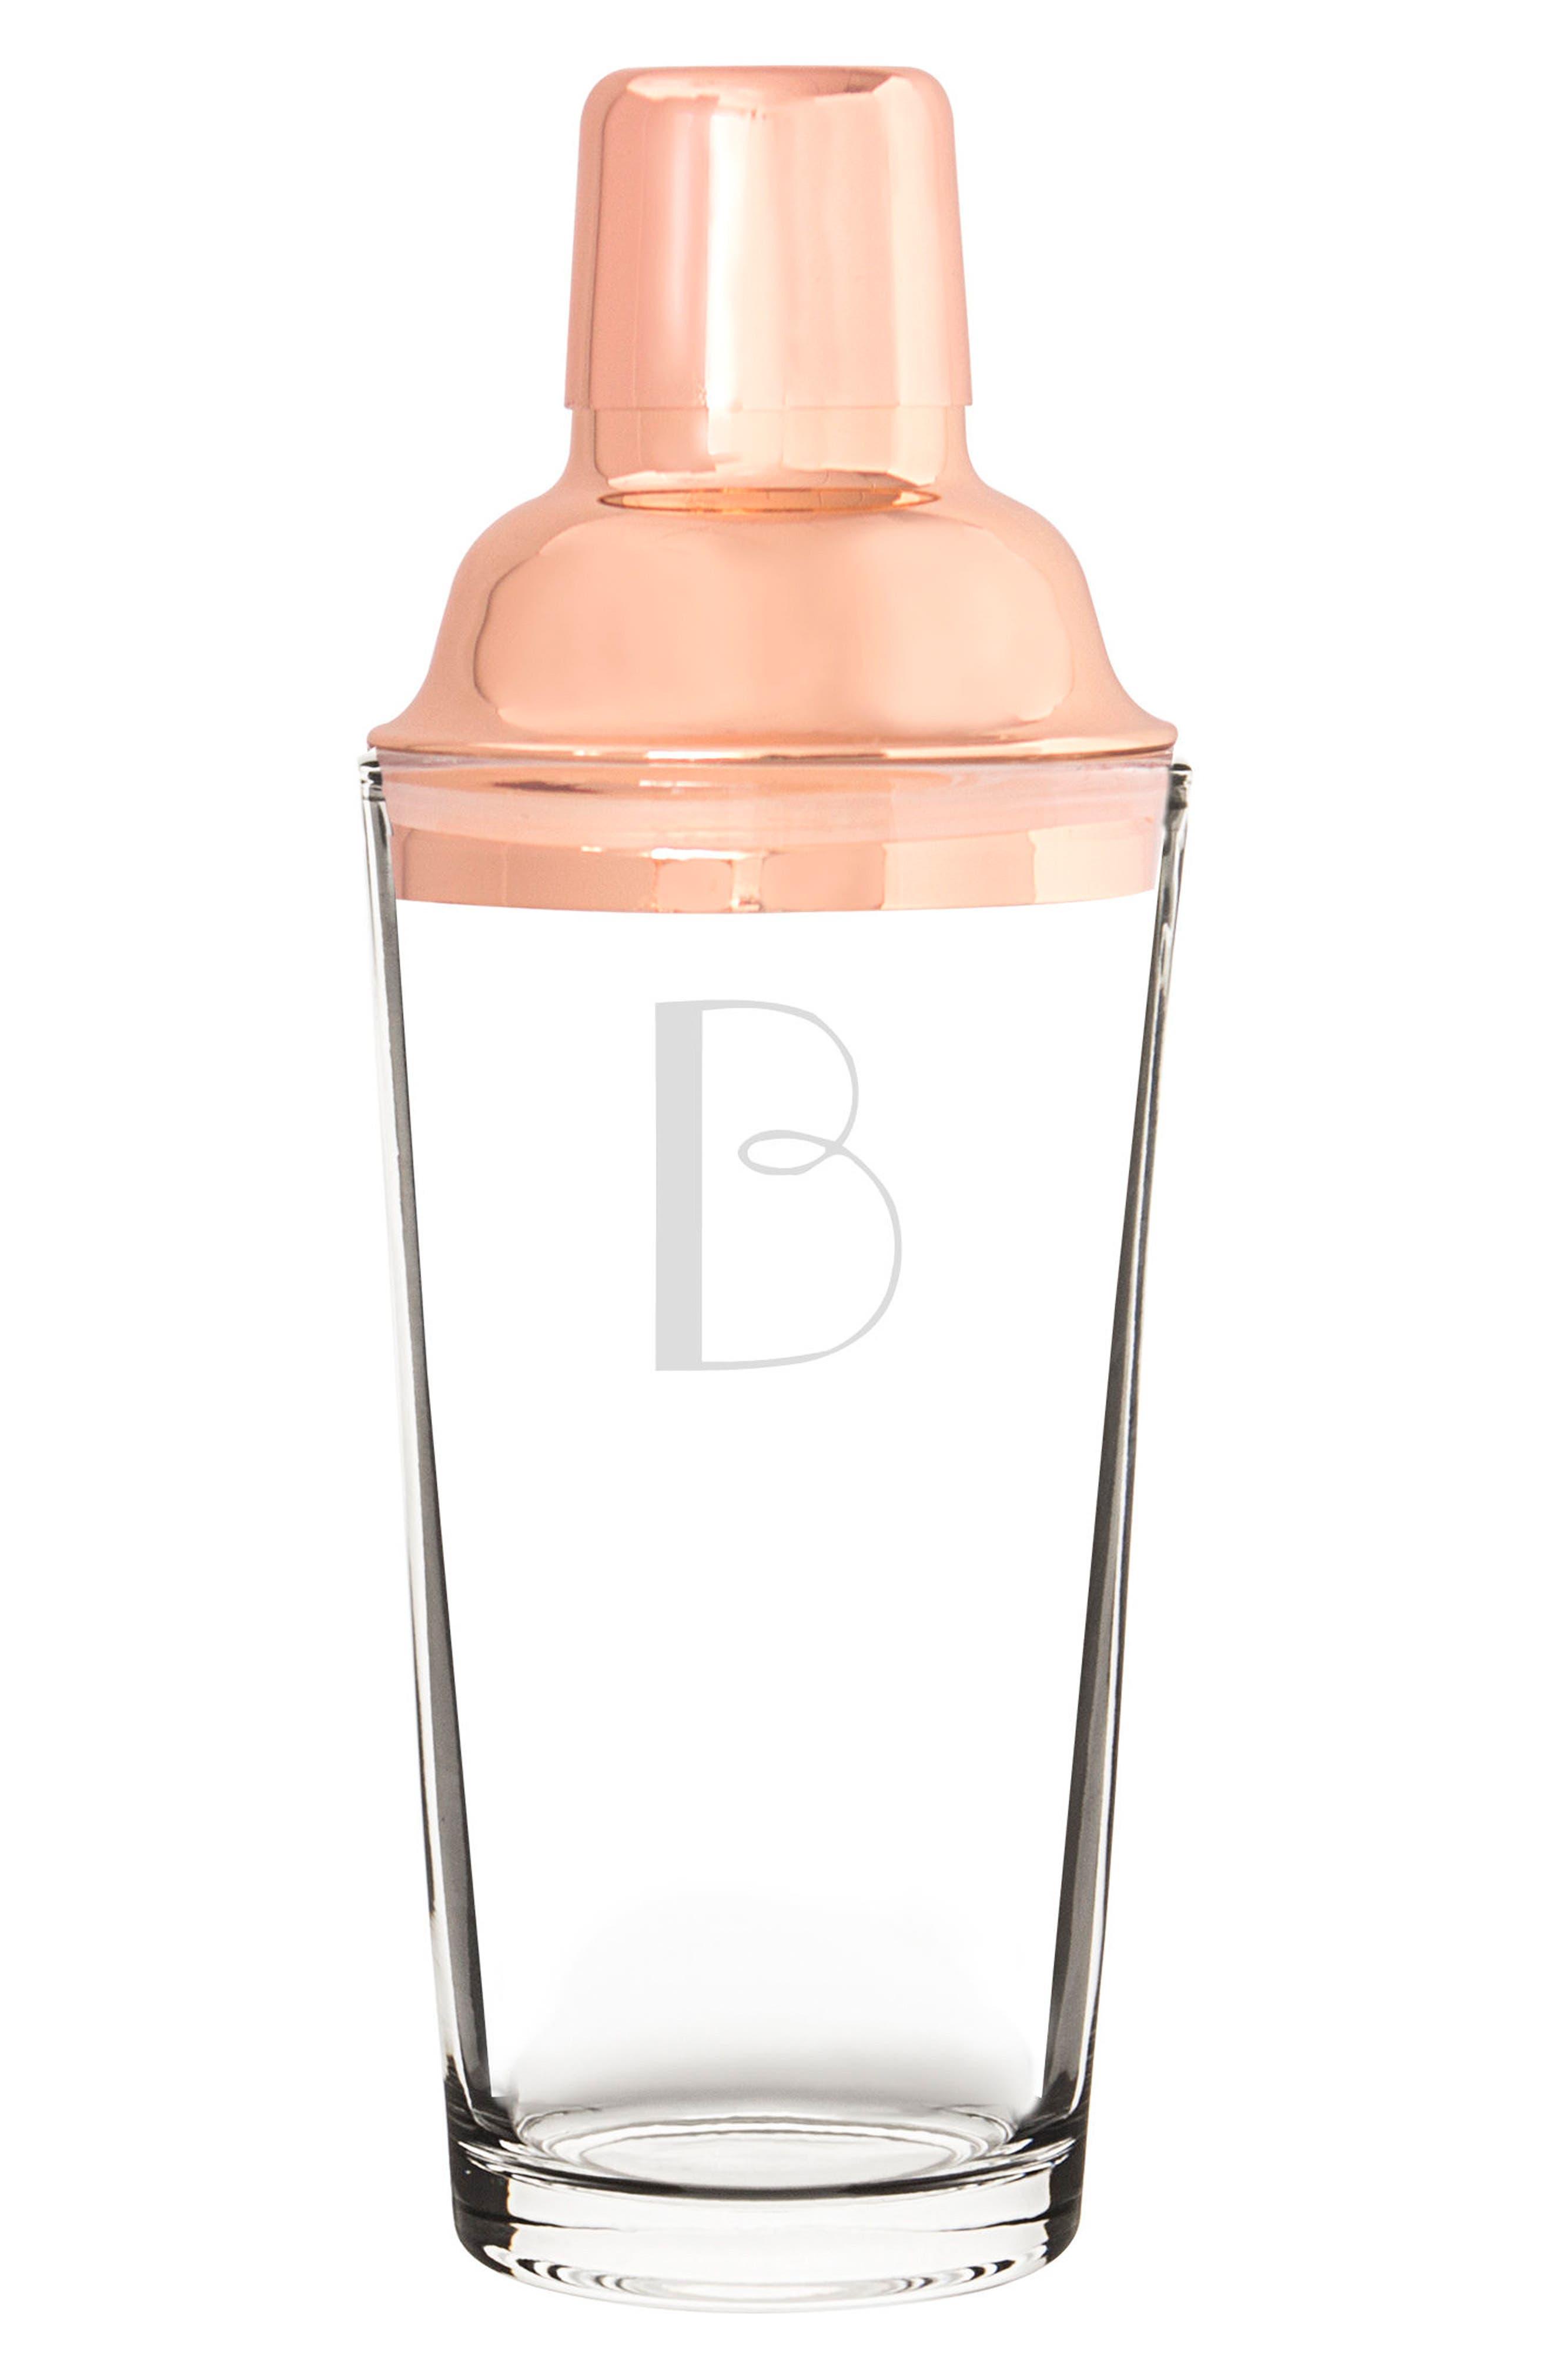 Monogram Coppertone Cocktail Shaker,                             Main thumbnail 3, color,